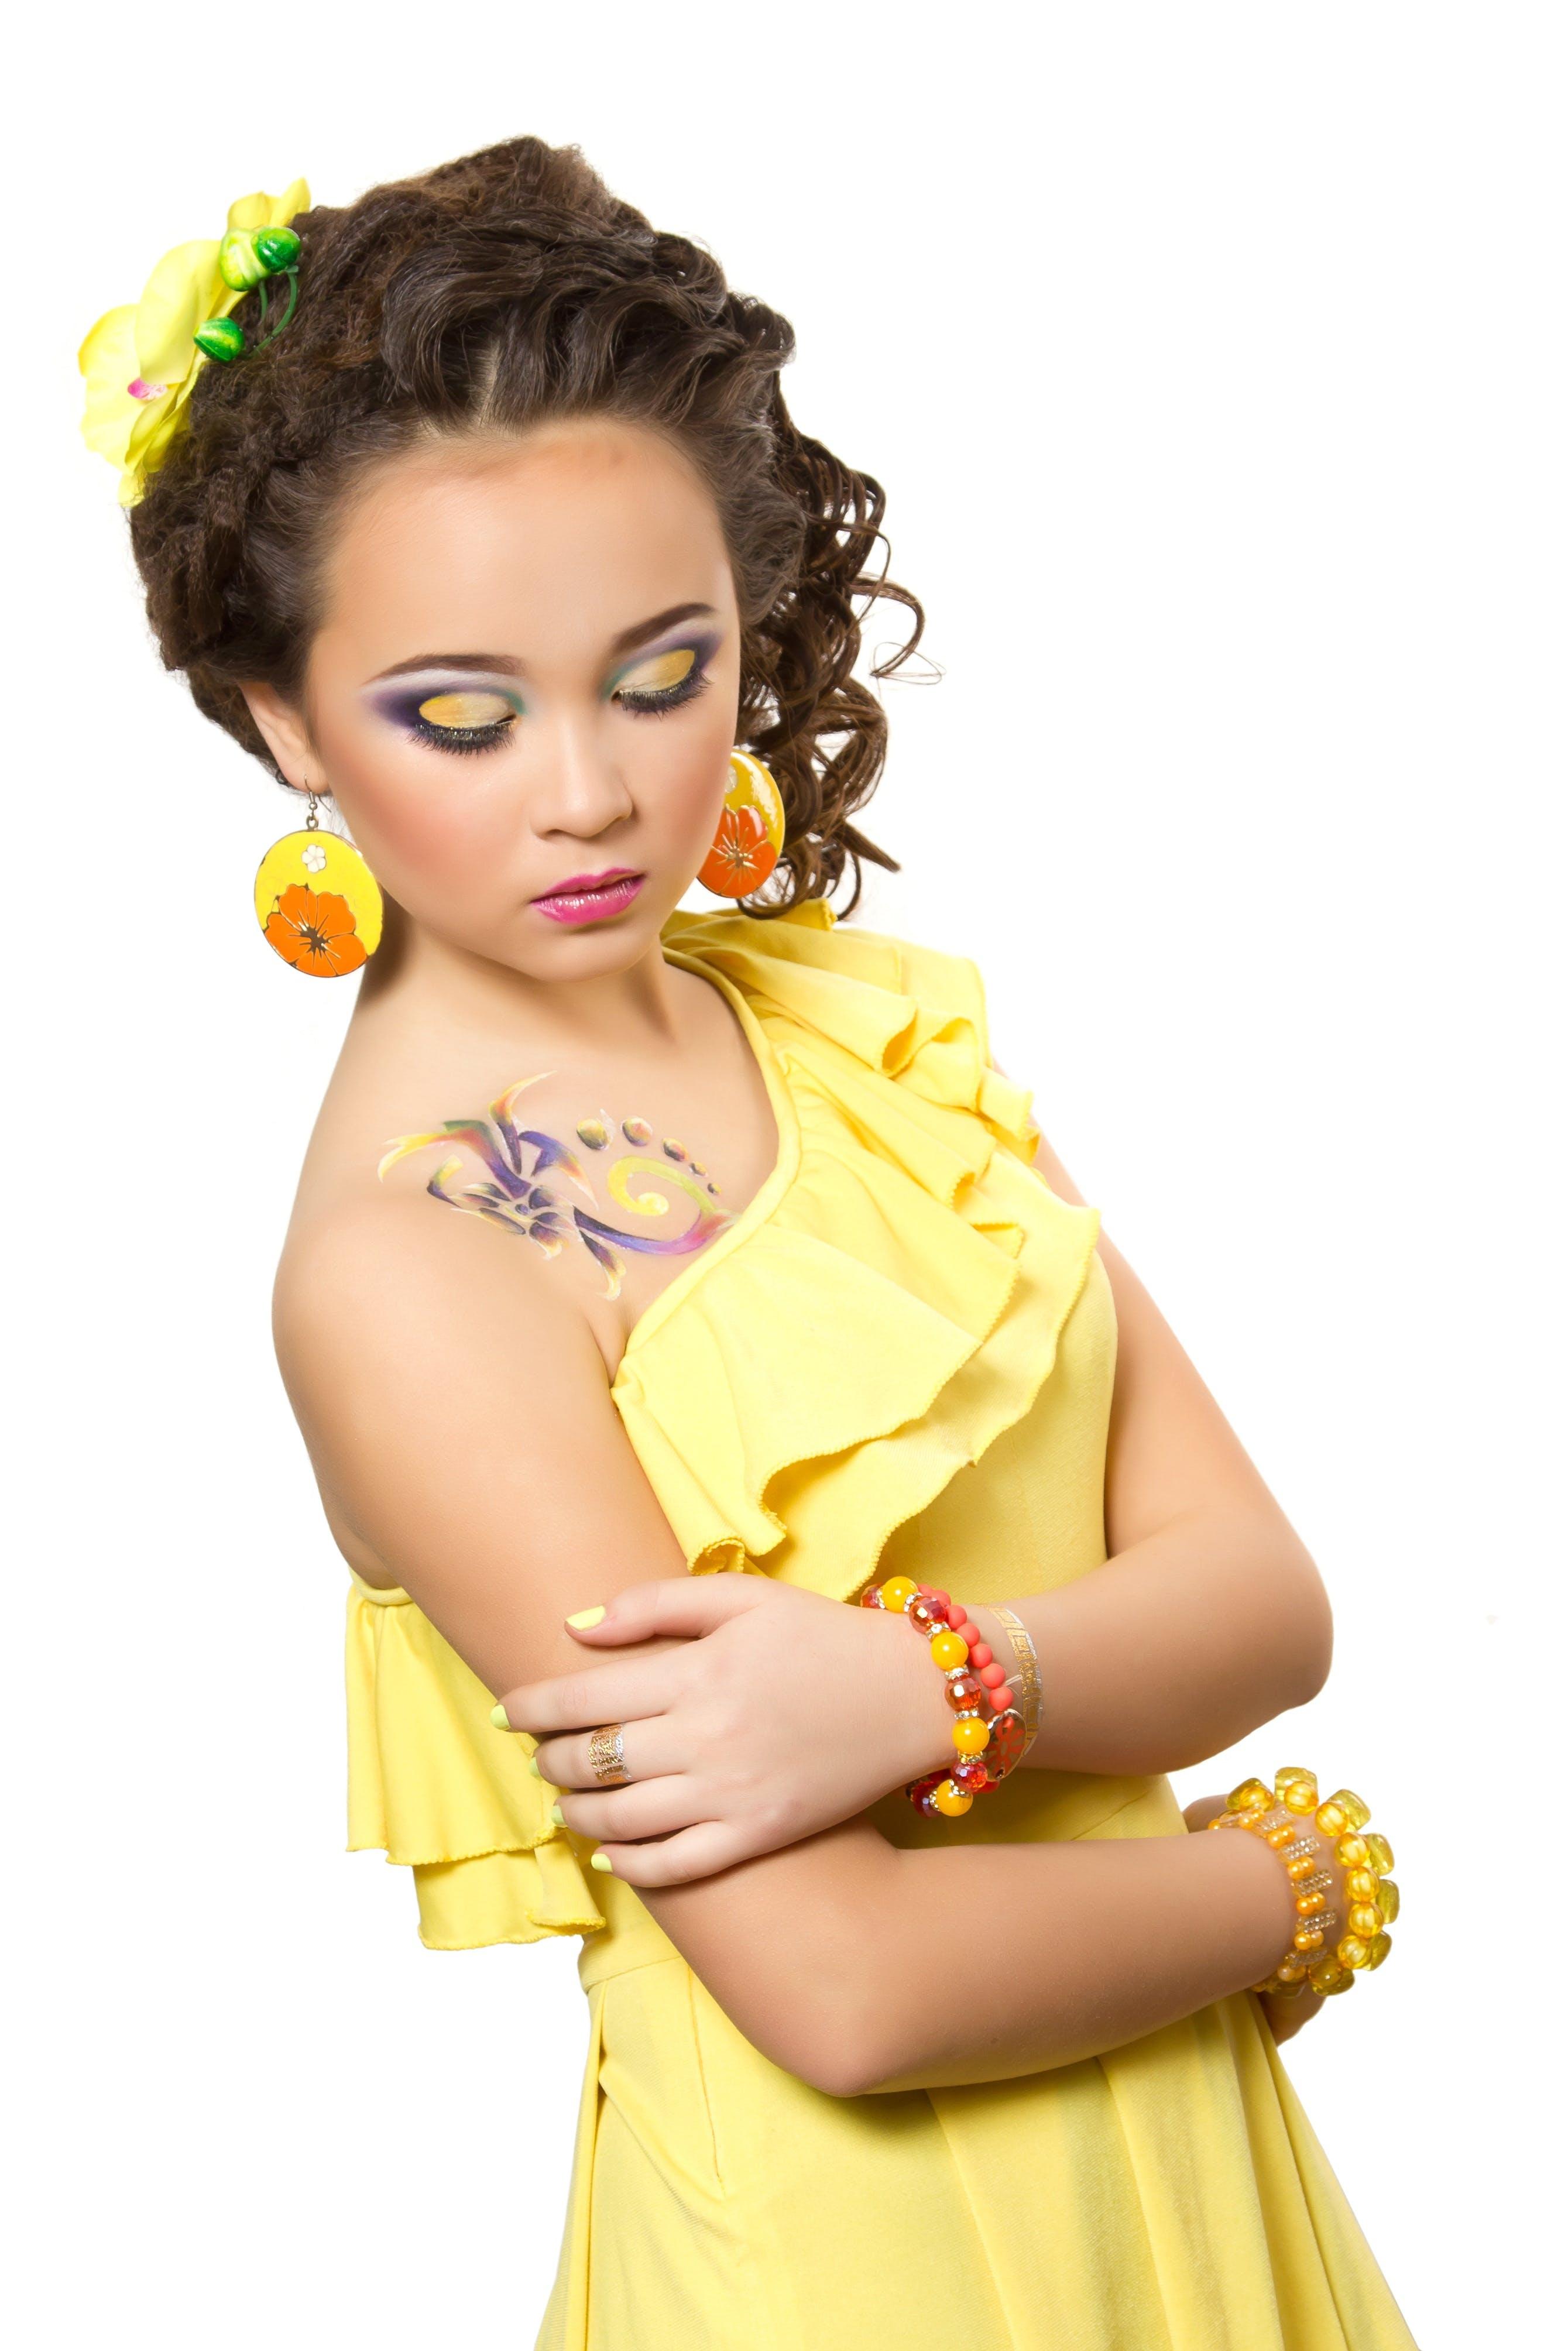 Free stock photo of girl, yellow, dress, hairstyle